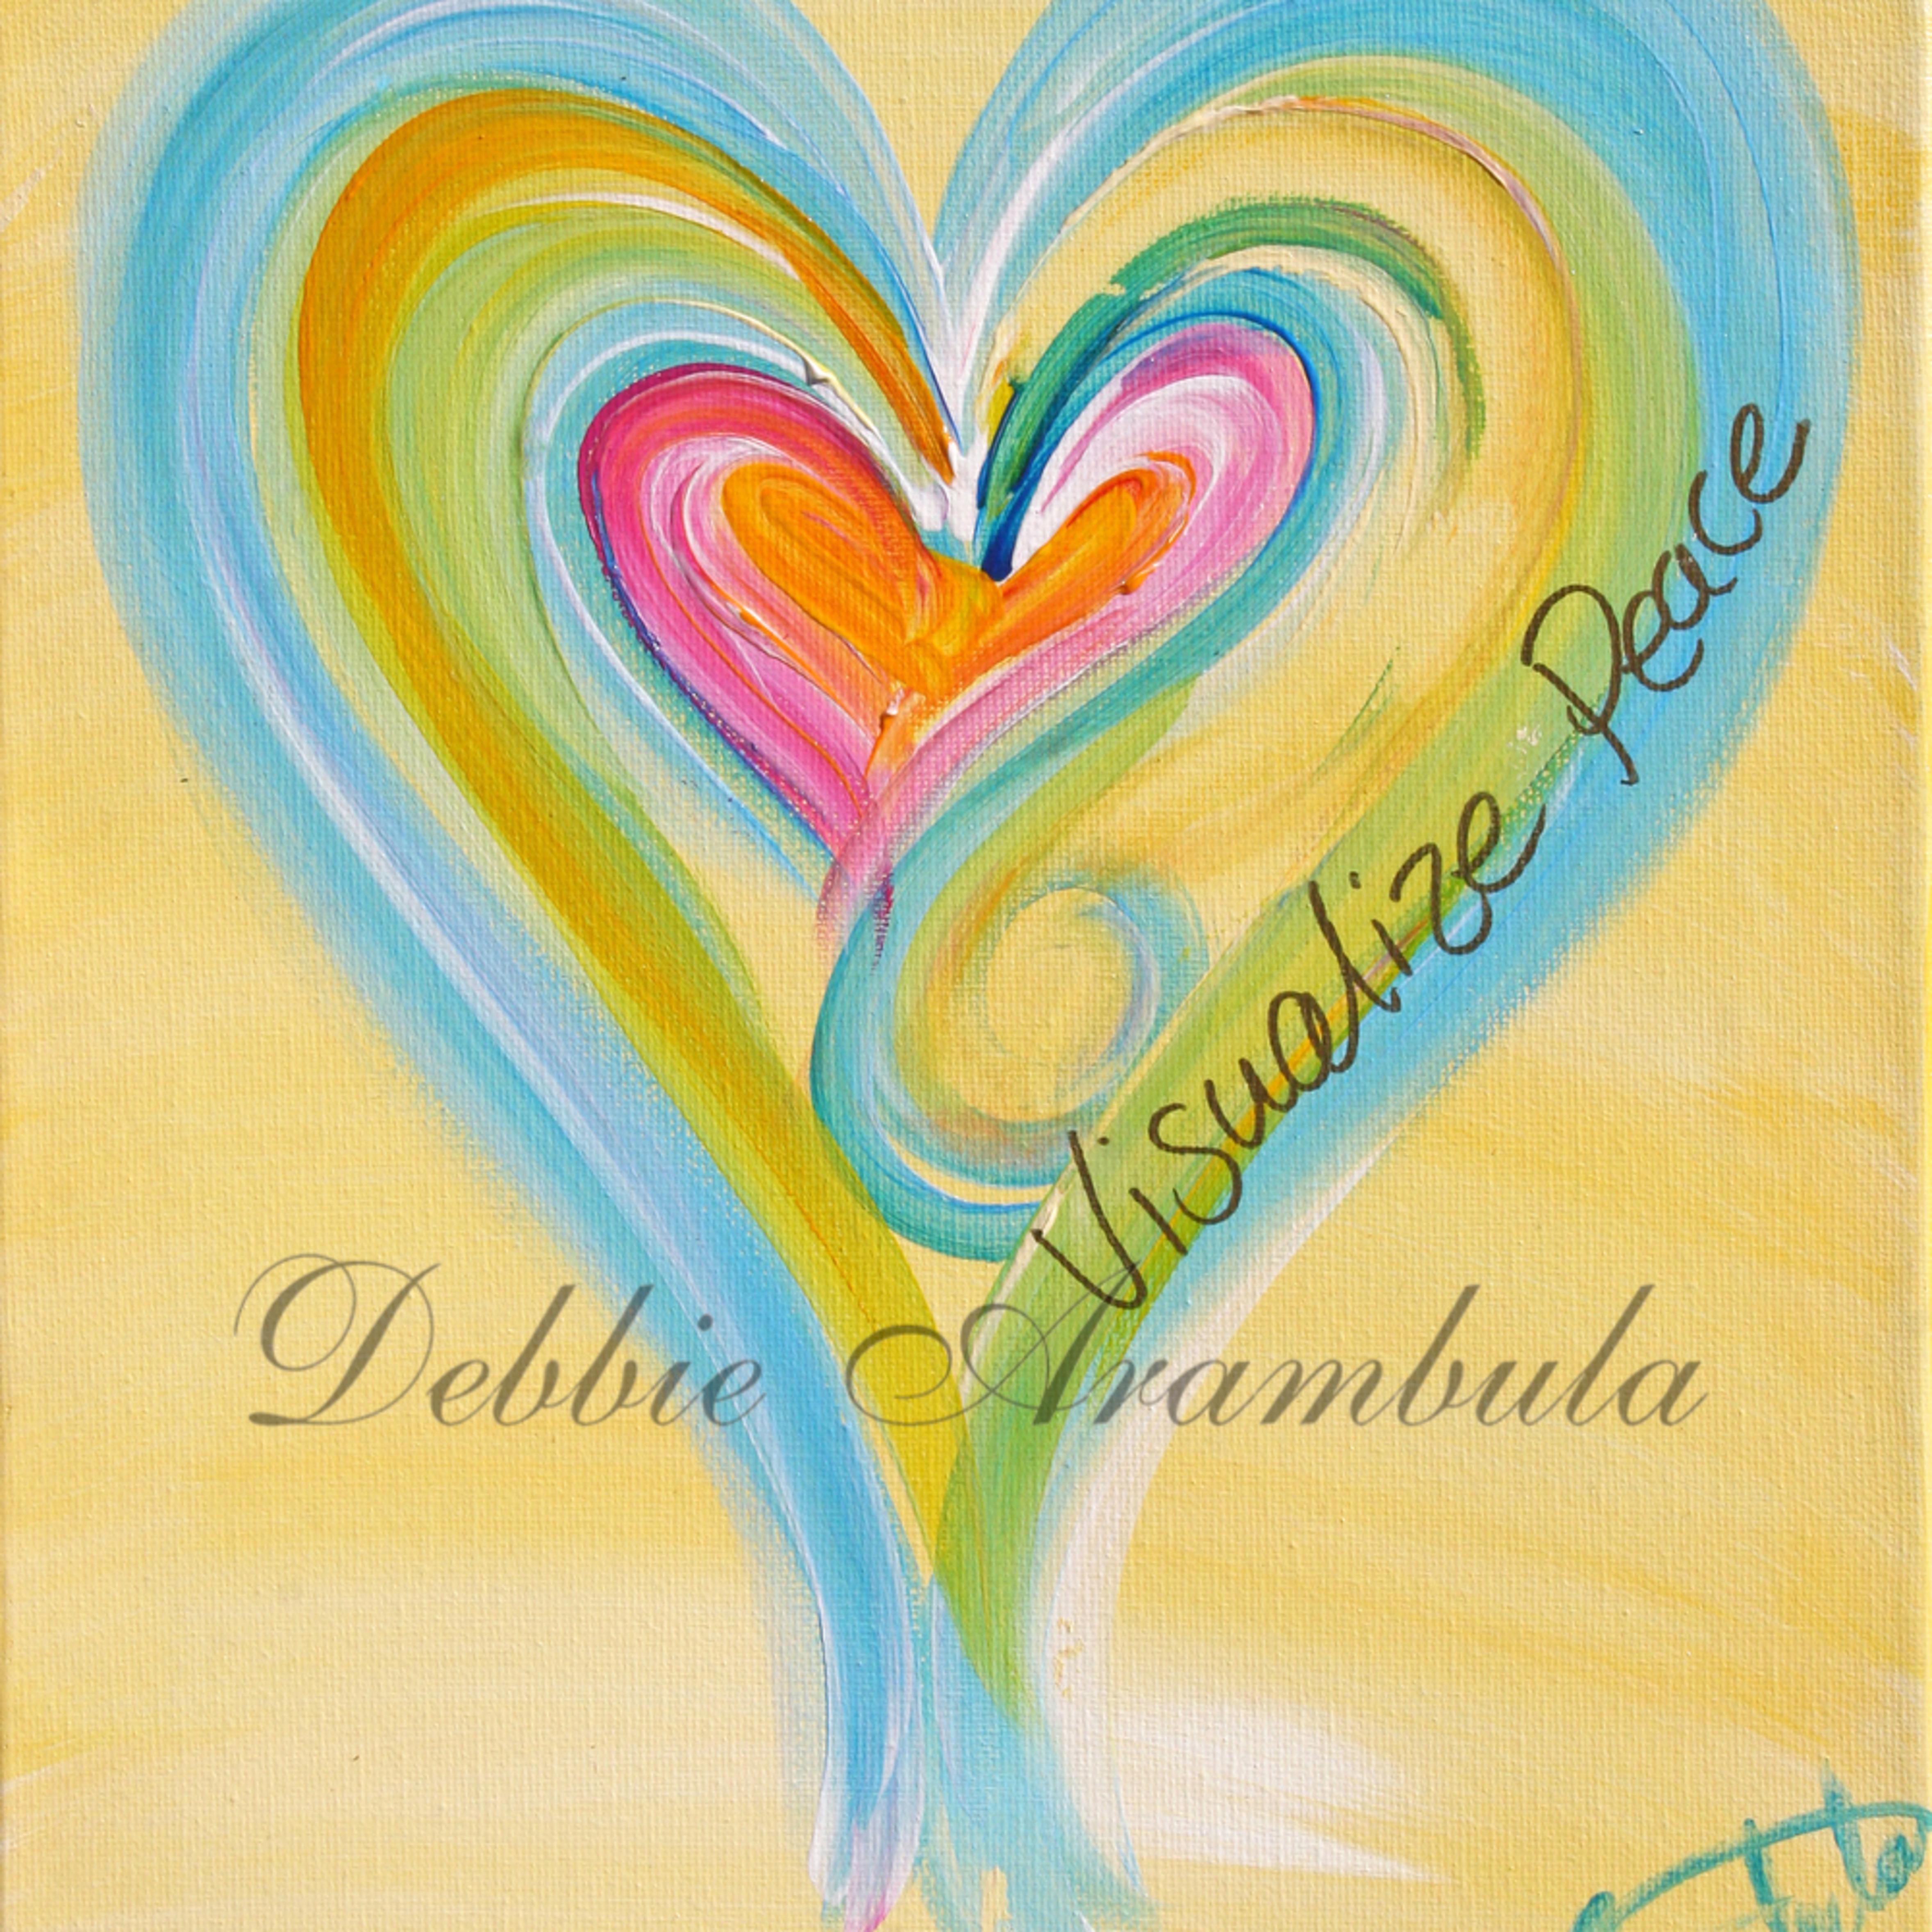 Visualize peace lplksc